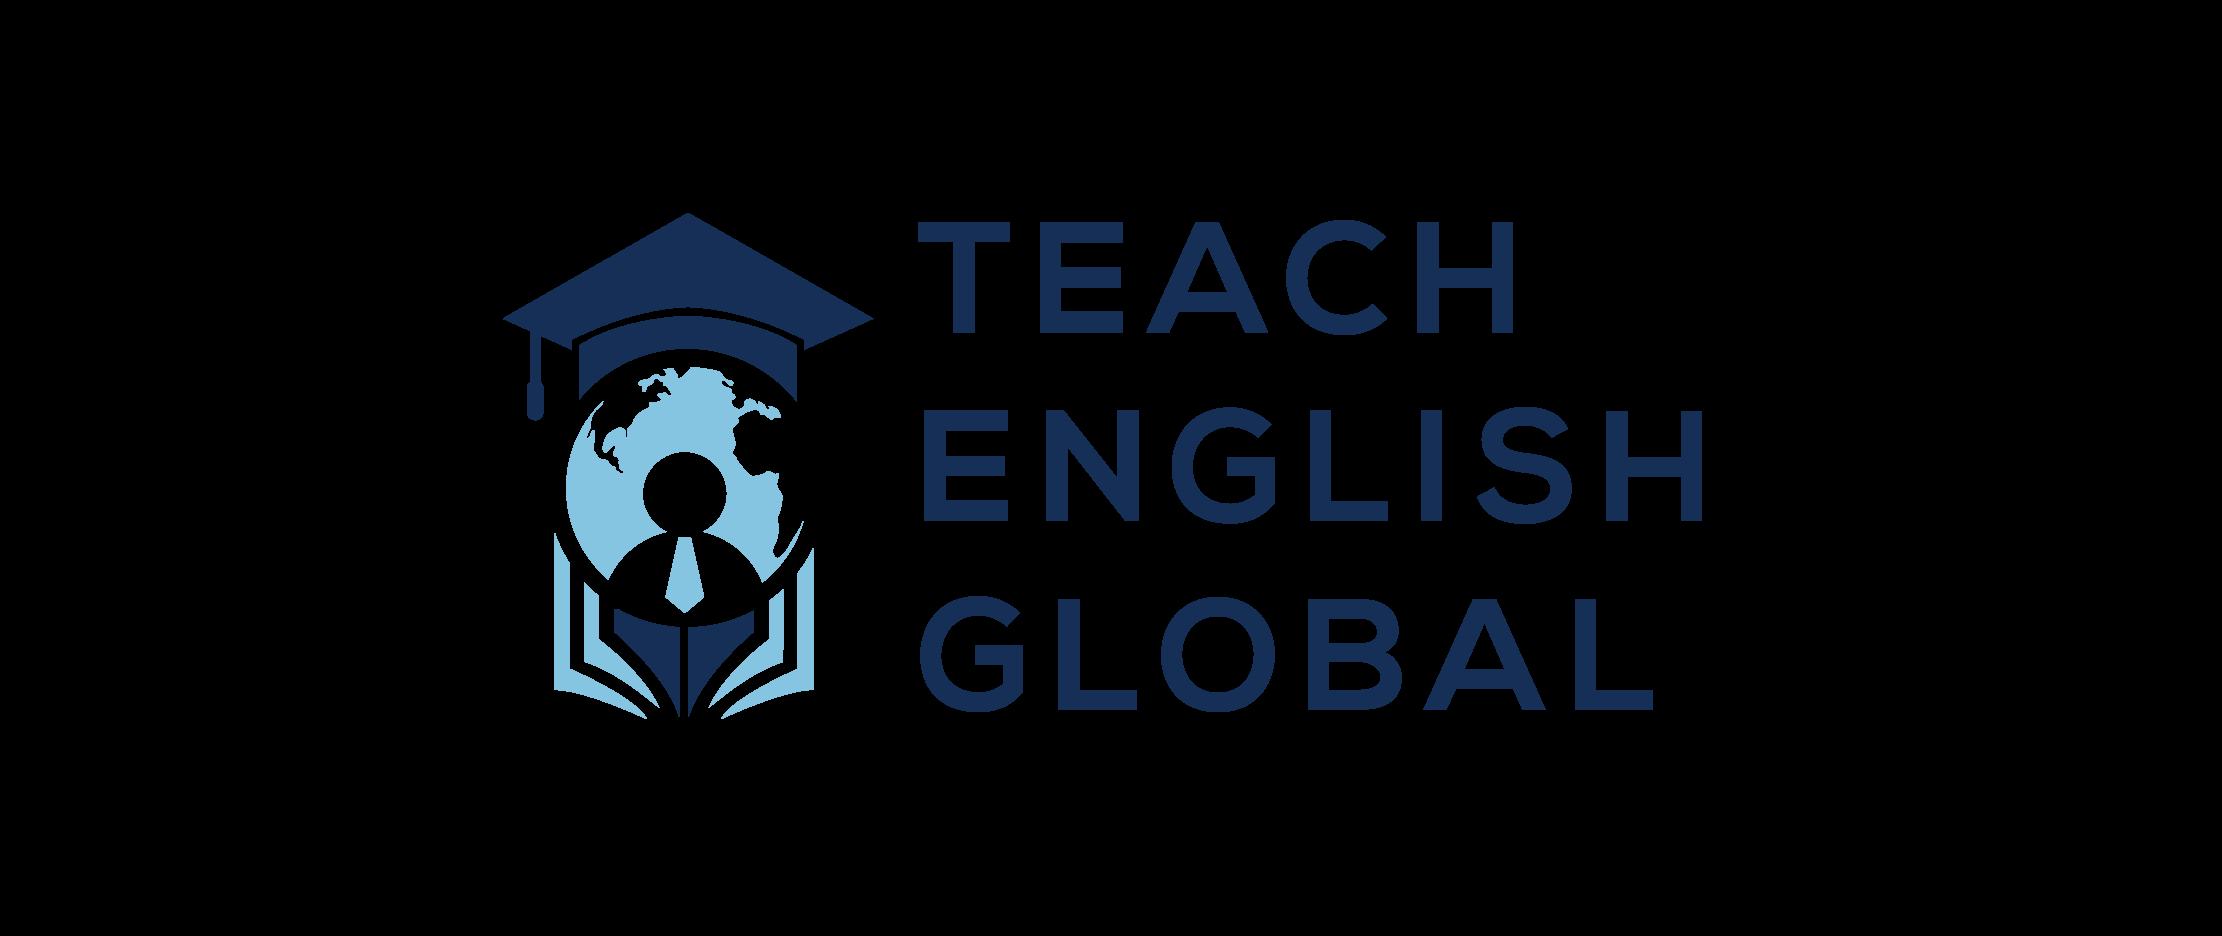 Teach English Global Logo